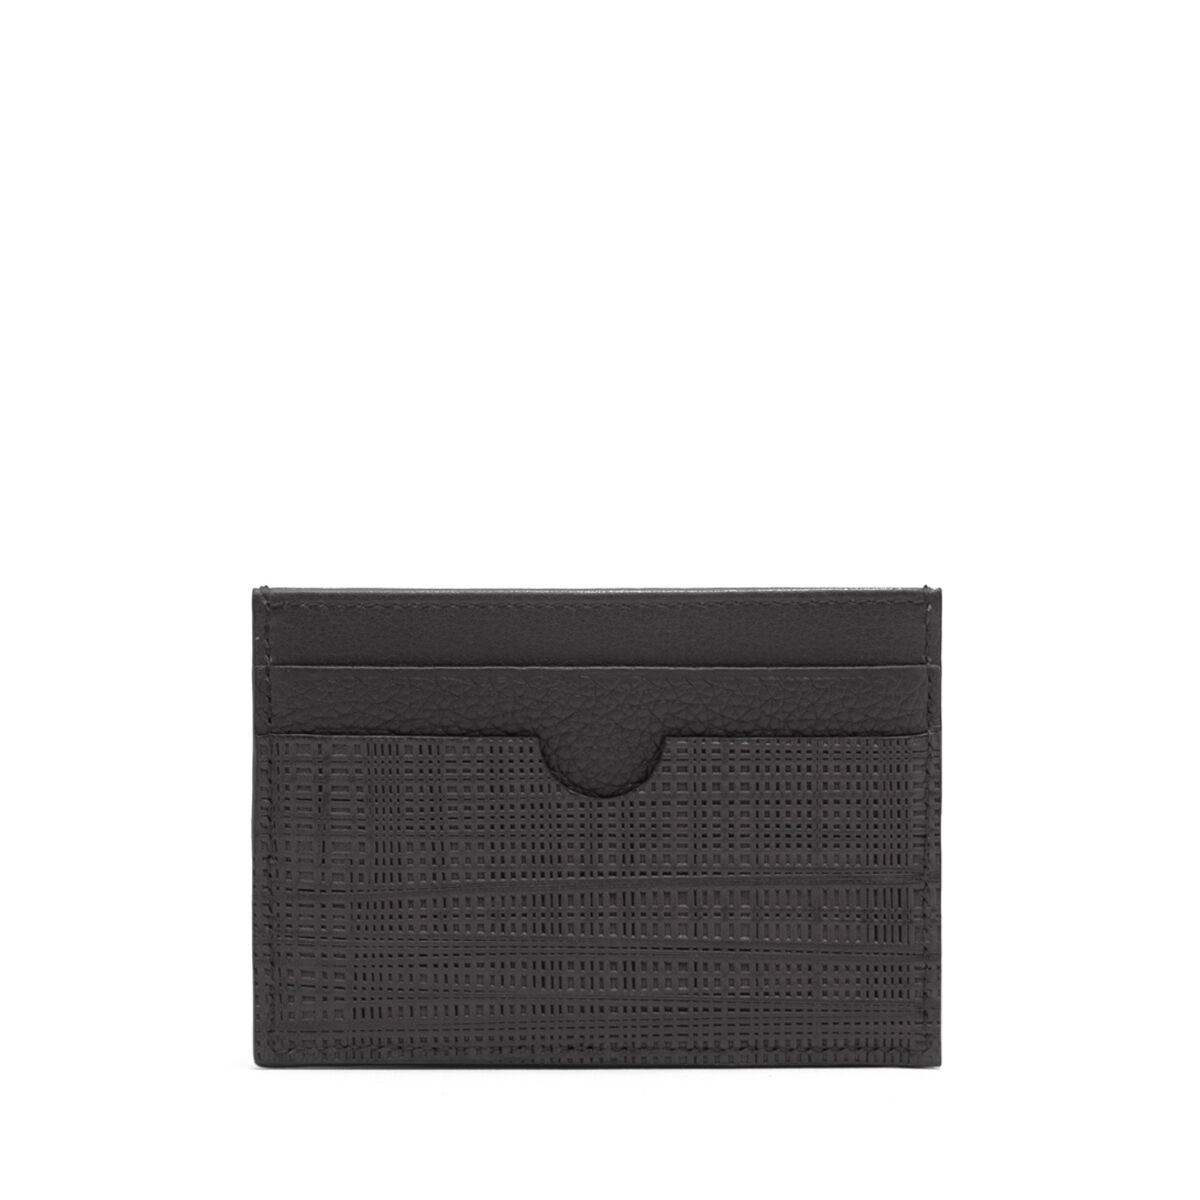 LOEWE Plain Card Holder Black all